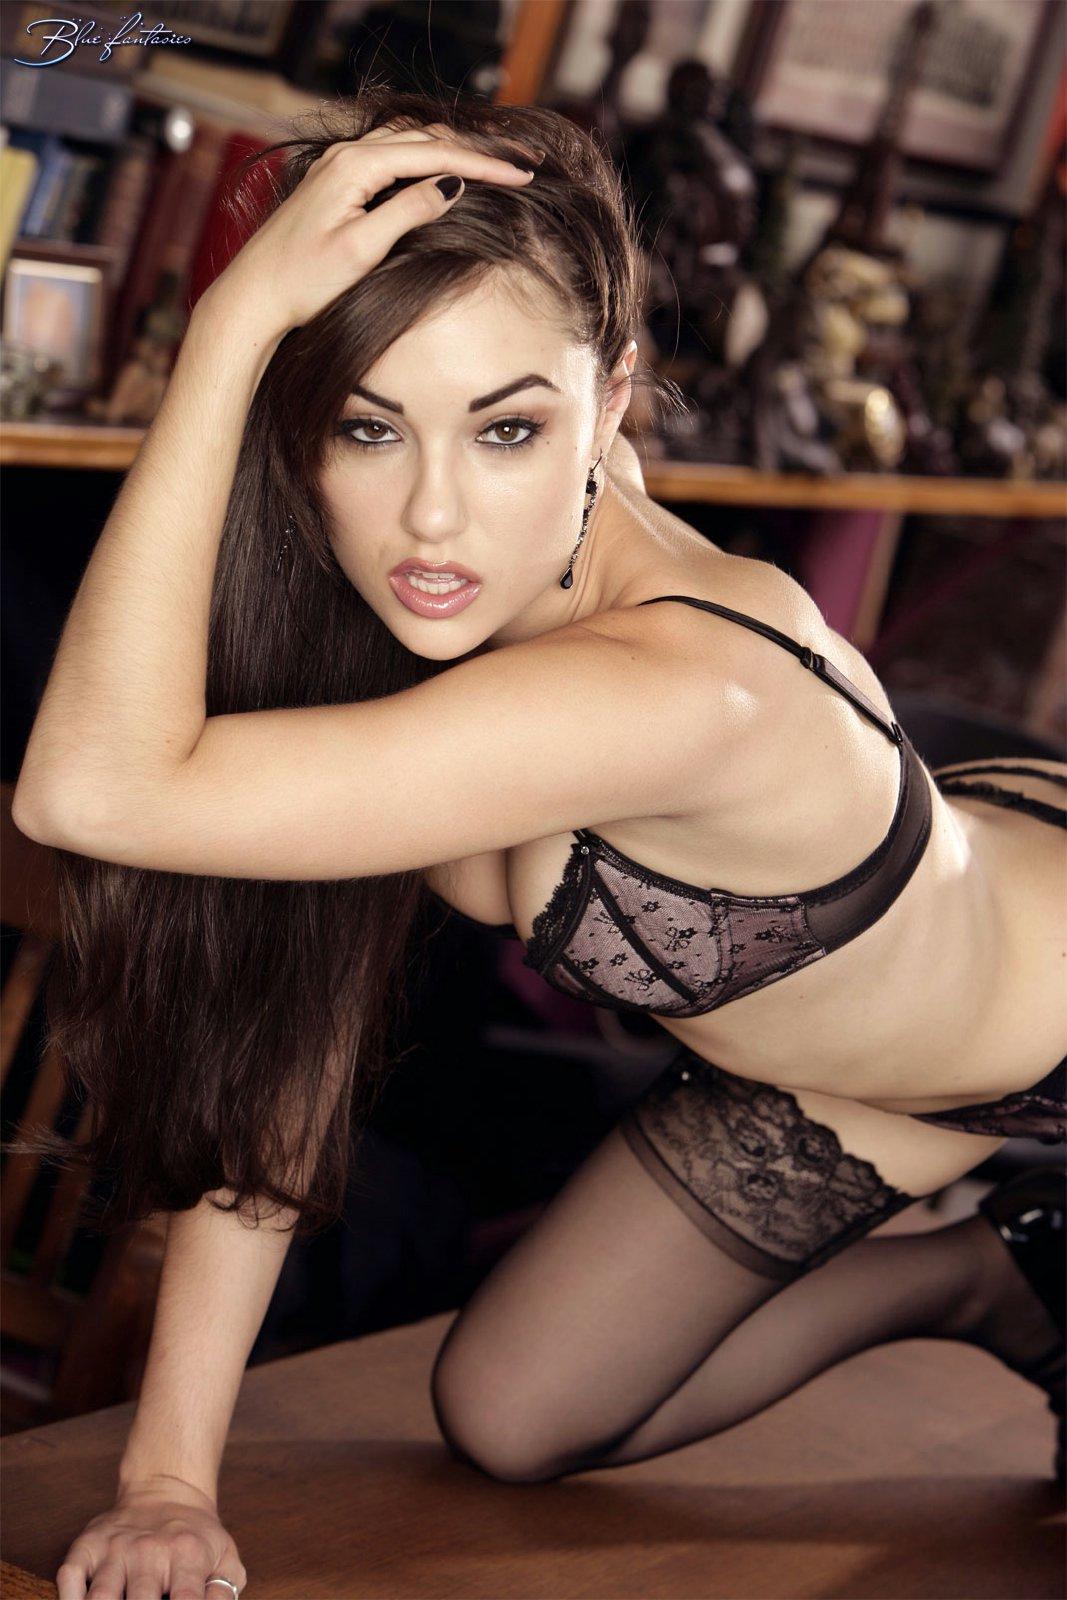 Pornstar babe Sasha Grey shows her tight ass and hairy pussy № 257915 бесплатно